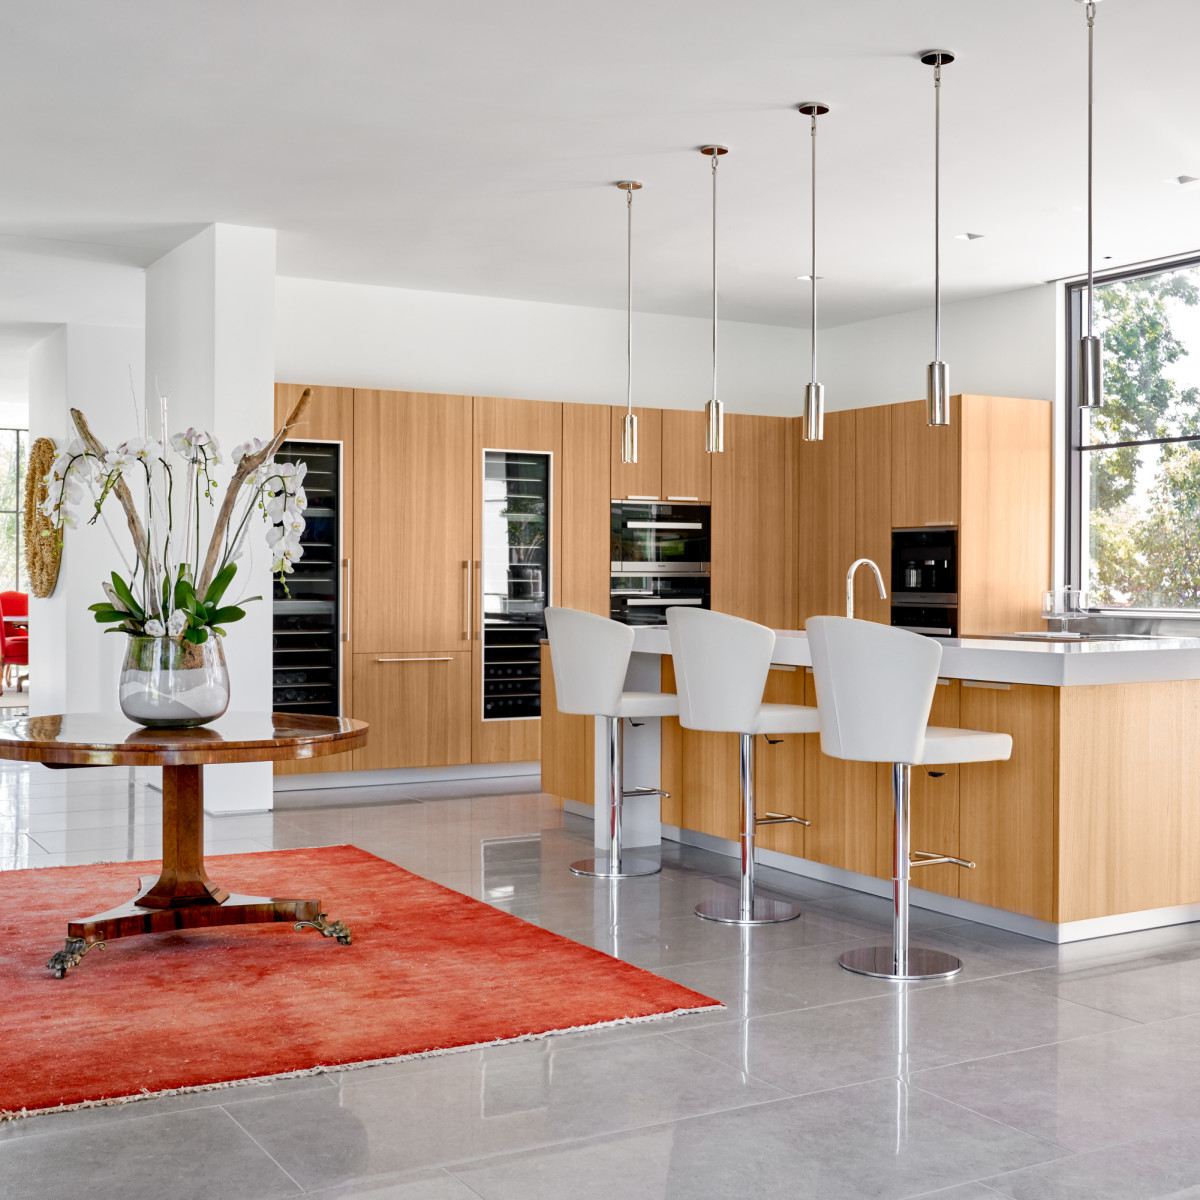 Bridge Hollow Residence kitchen